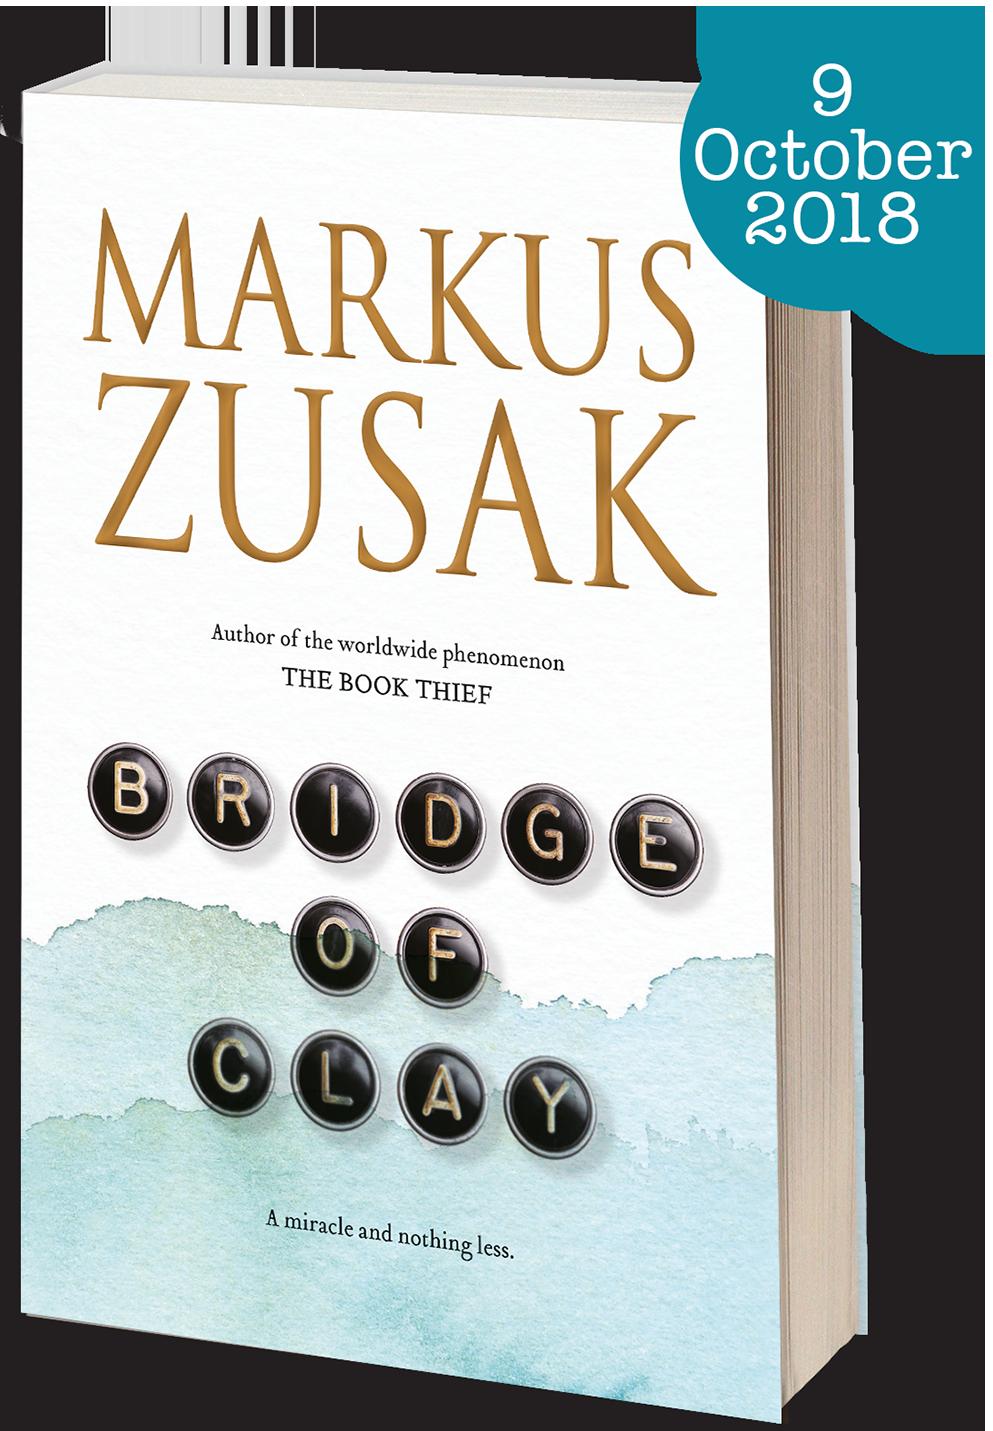 New book from Markus Zusak - Bridge of Clay - Hardcover - 9781743534816